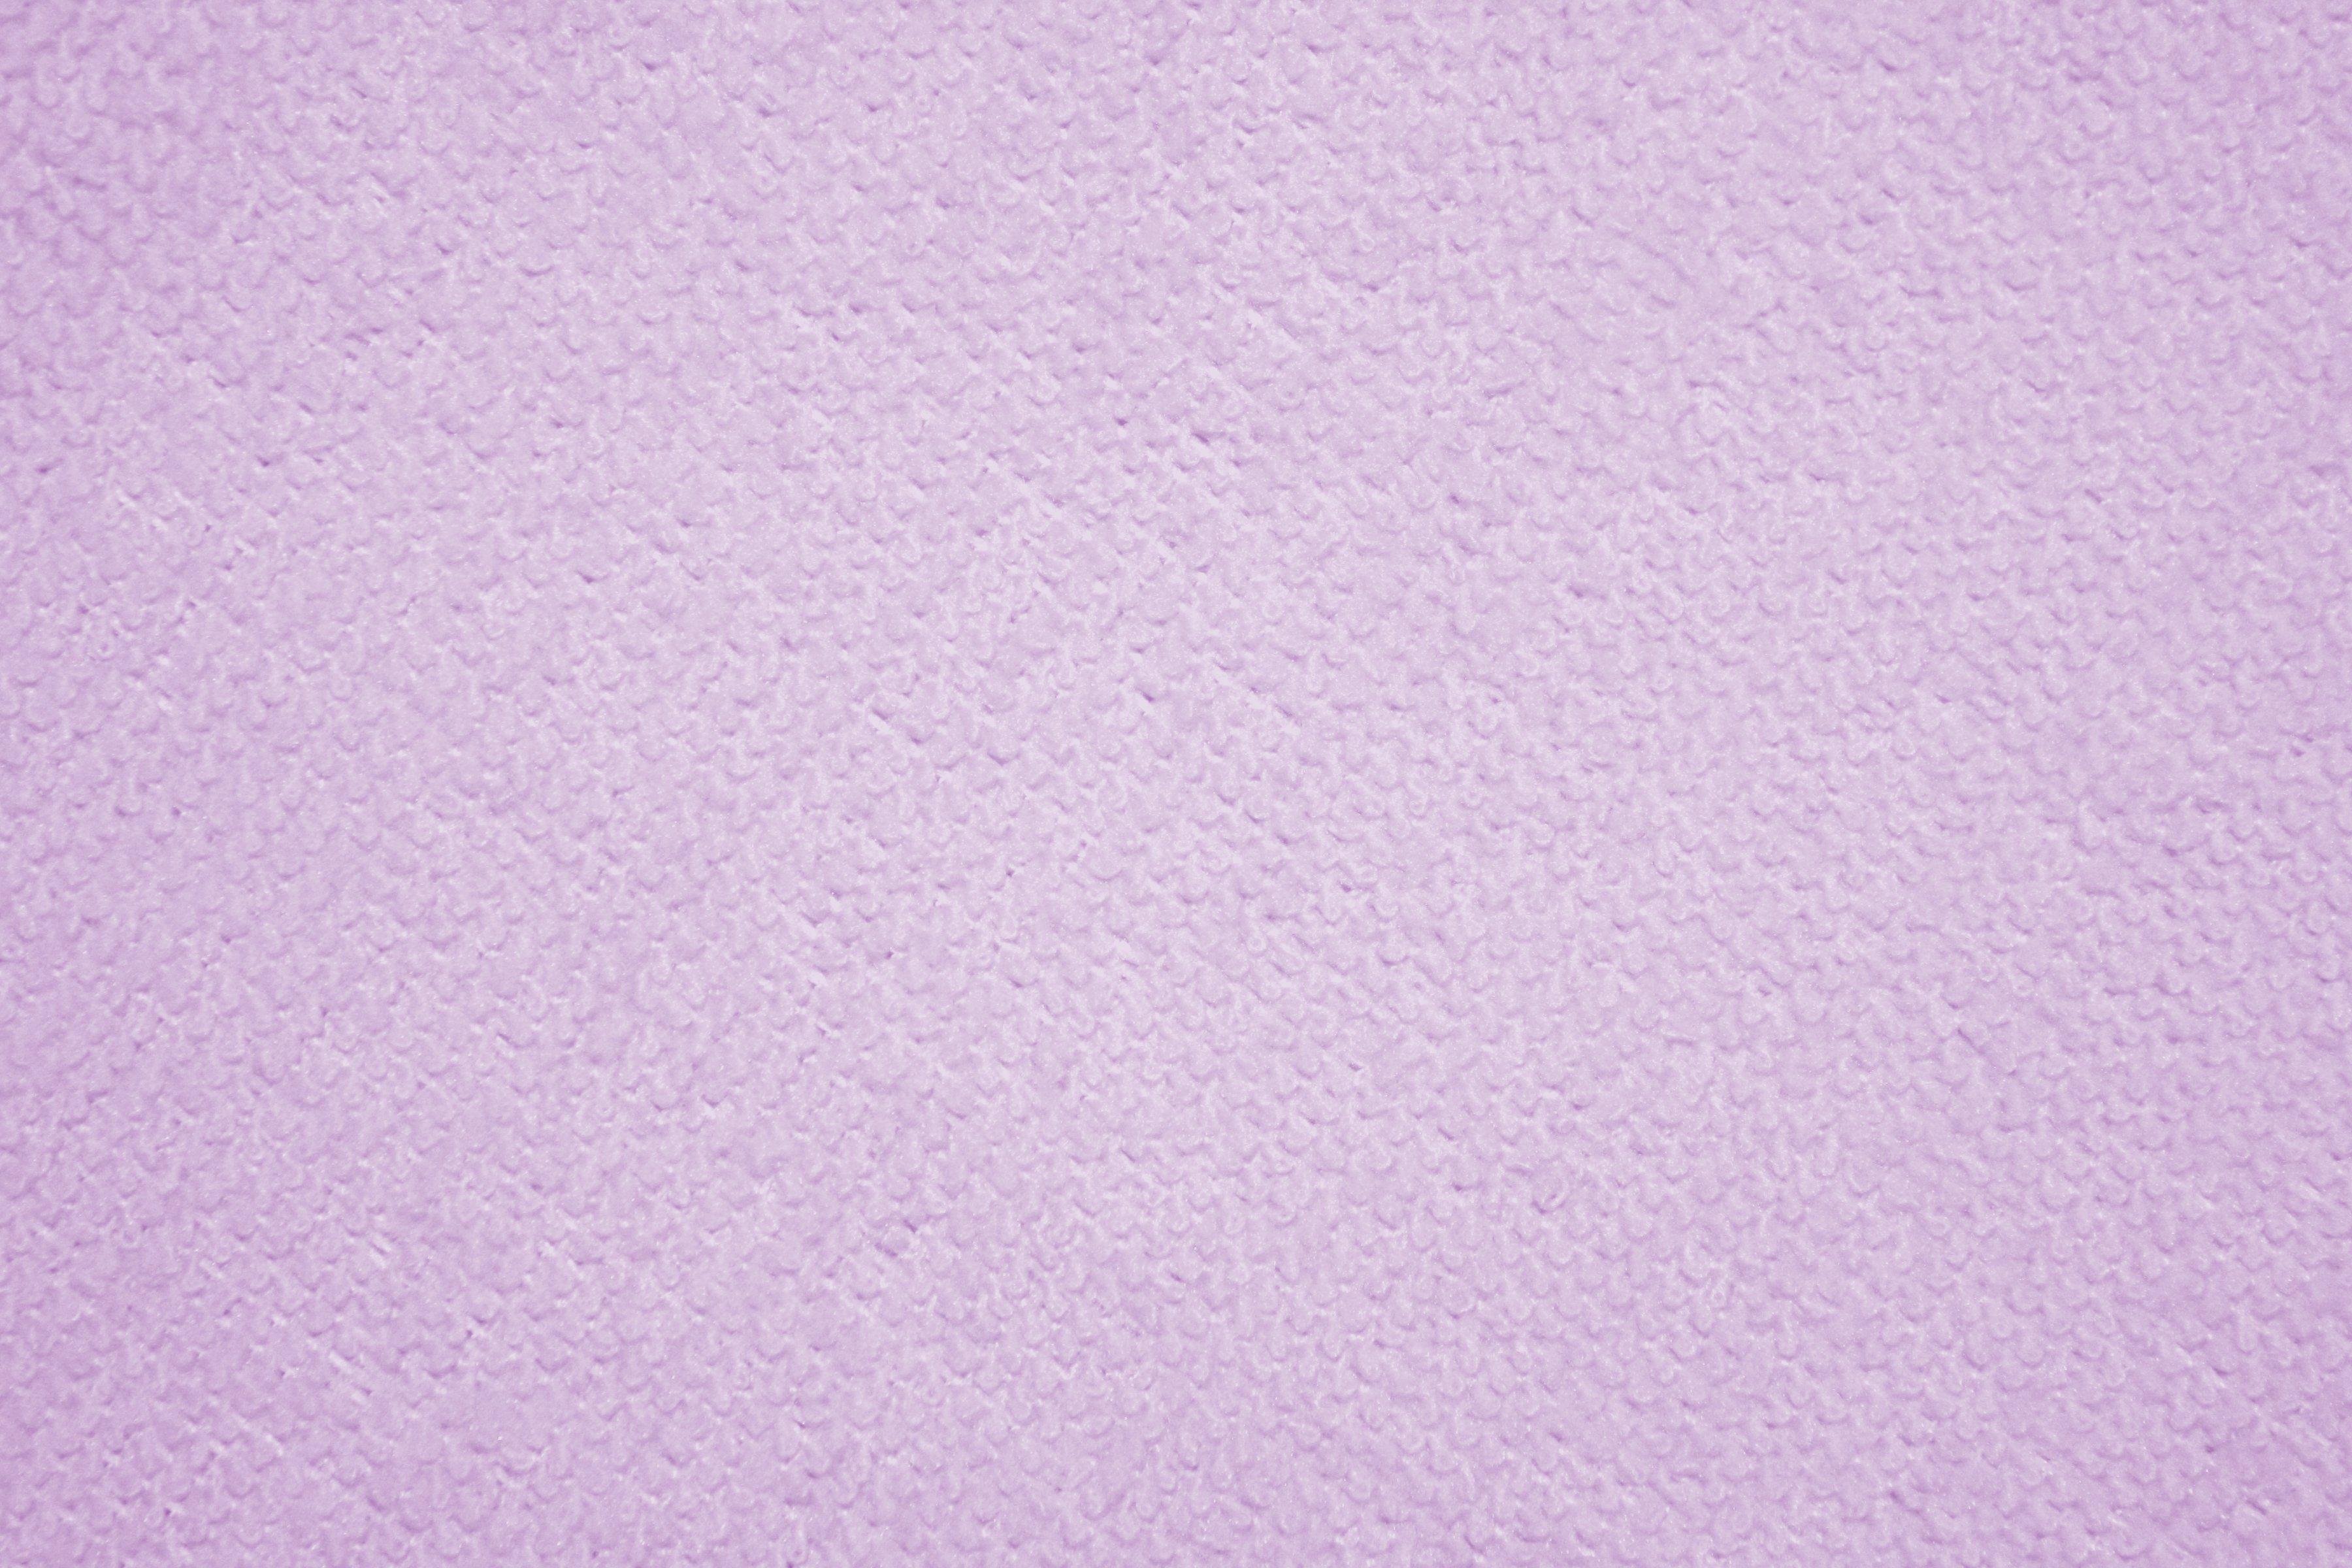 Off White Plastic Texture Dusty Purple Microfibe...